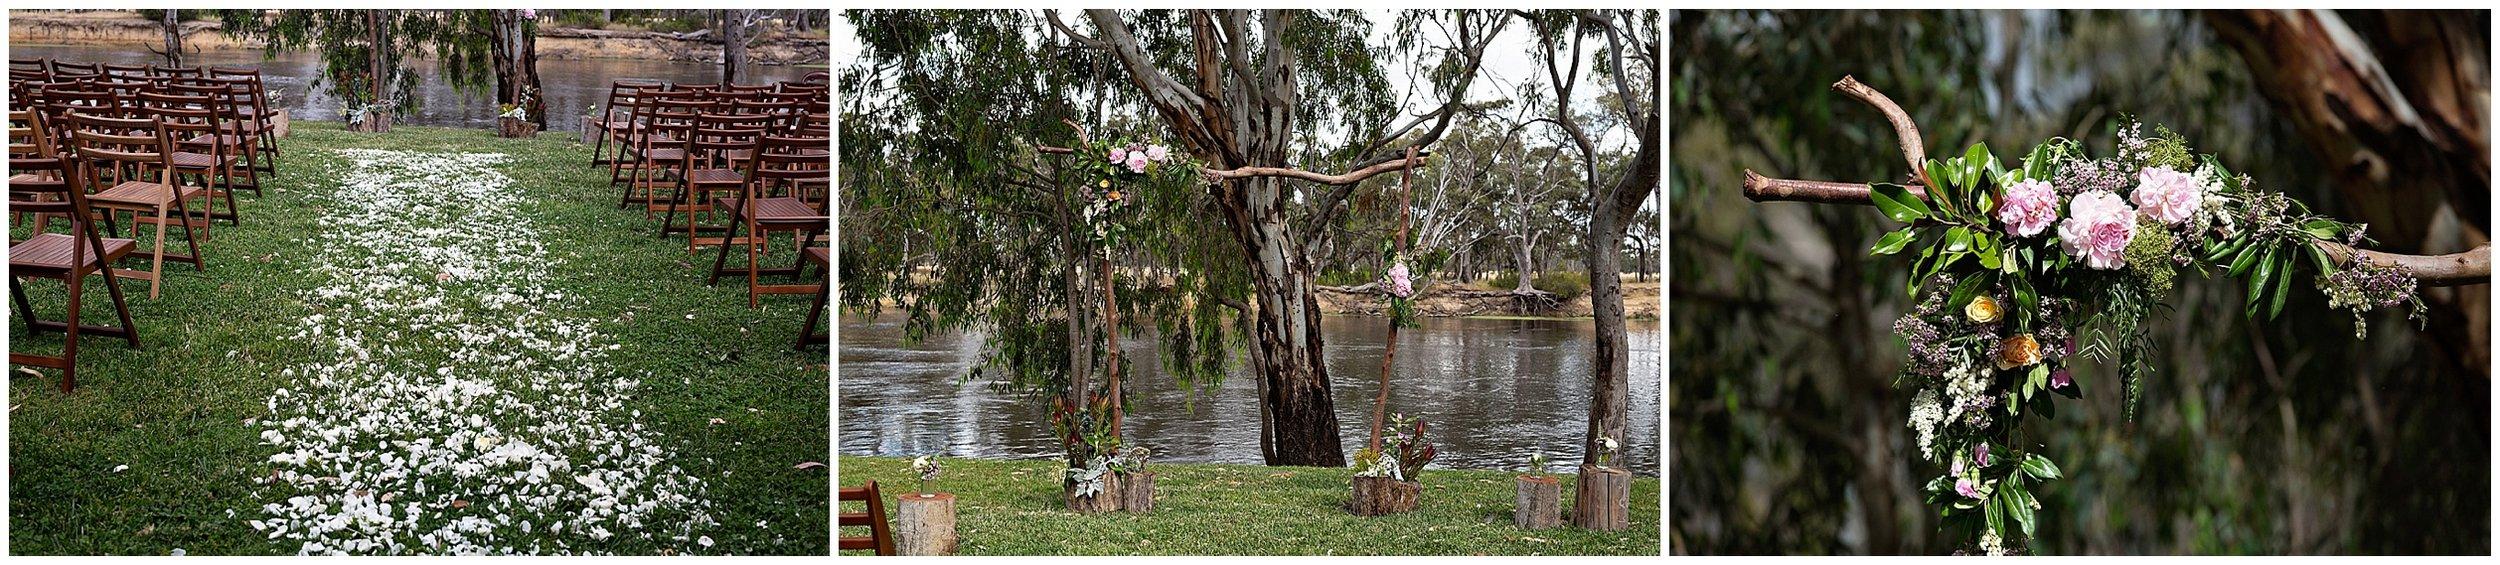 shepparton-wedding-photographer_0146.jpg